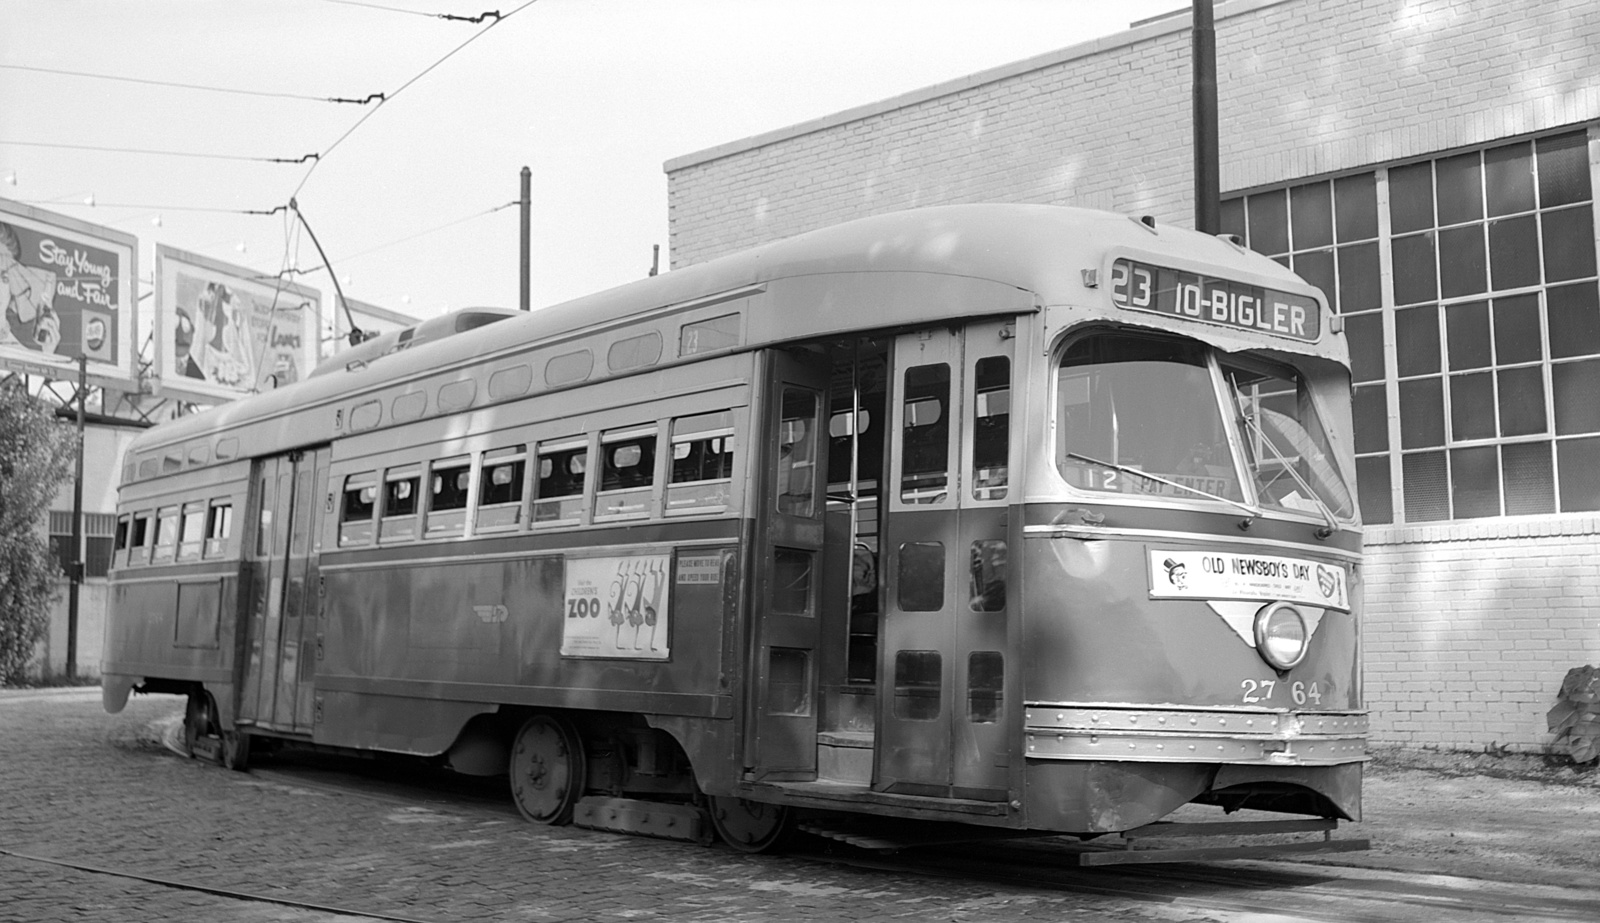 (446k, 1600x923)<br><b>Country:</b> United States<br><b>City:</b> Philadelphia, PA<br><b>System:</b> SEPTA (or Predecessor)<br><b>Line:</b> Rt. 23-Germantown<br><b>Location:</b> Bethlehem Pike/Chestnut Hill Loop<br><b>Car:</b> PTC/SEPTA Postwar All-electric PCC (St.Louis, 1947) 2764 <br><b>Collection of:</b> David Pirmann<br><b>Date:</b> 6/9/1959<br><b>Viewed (this week/total):</b> 0 / 85